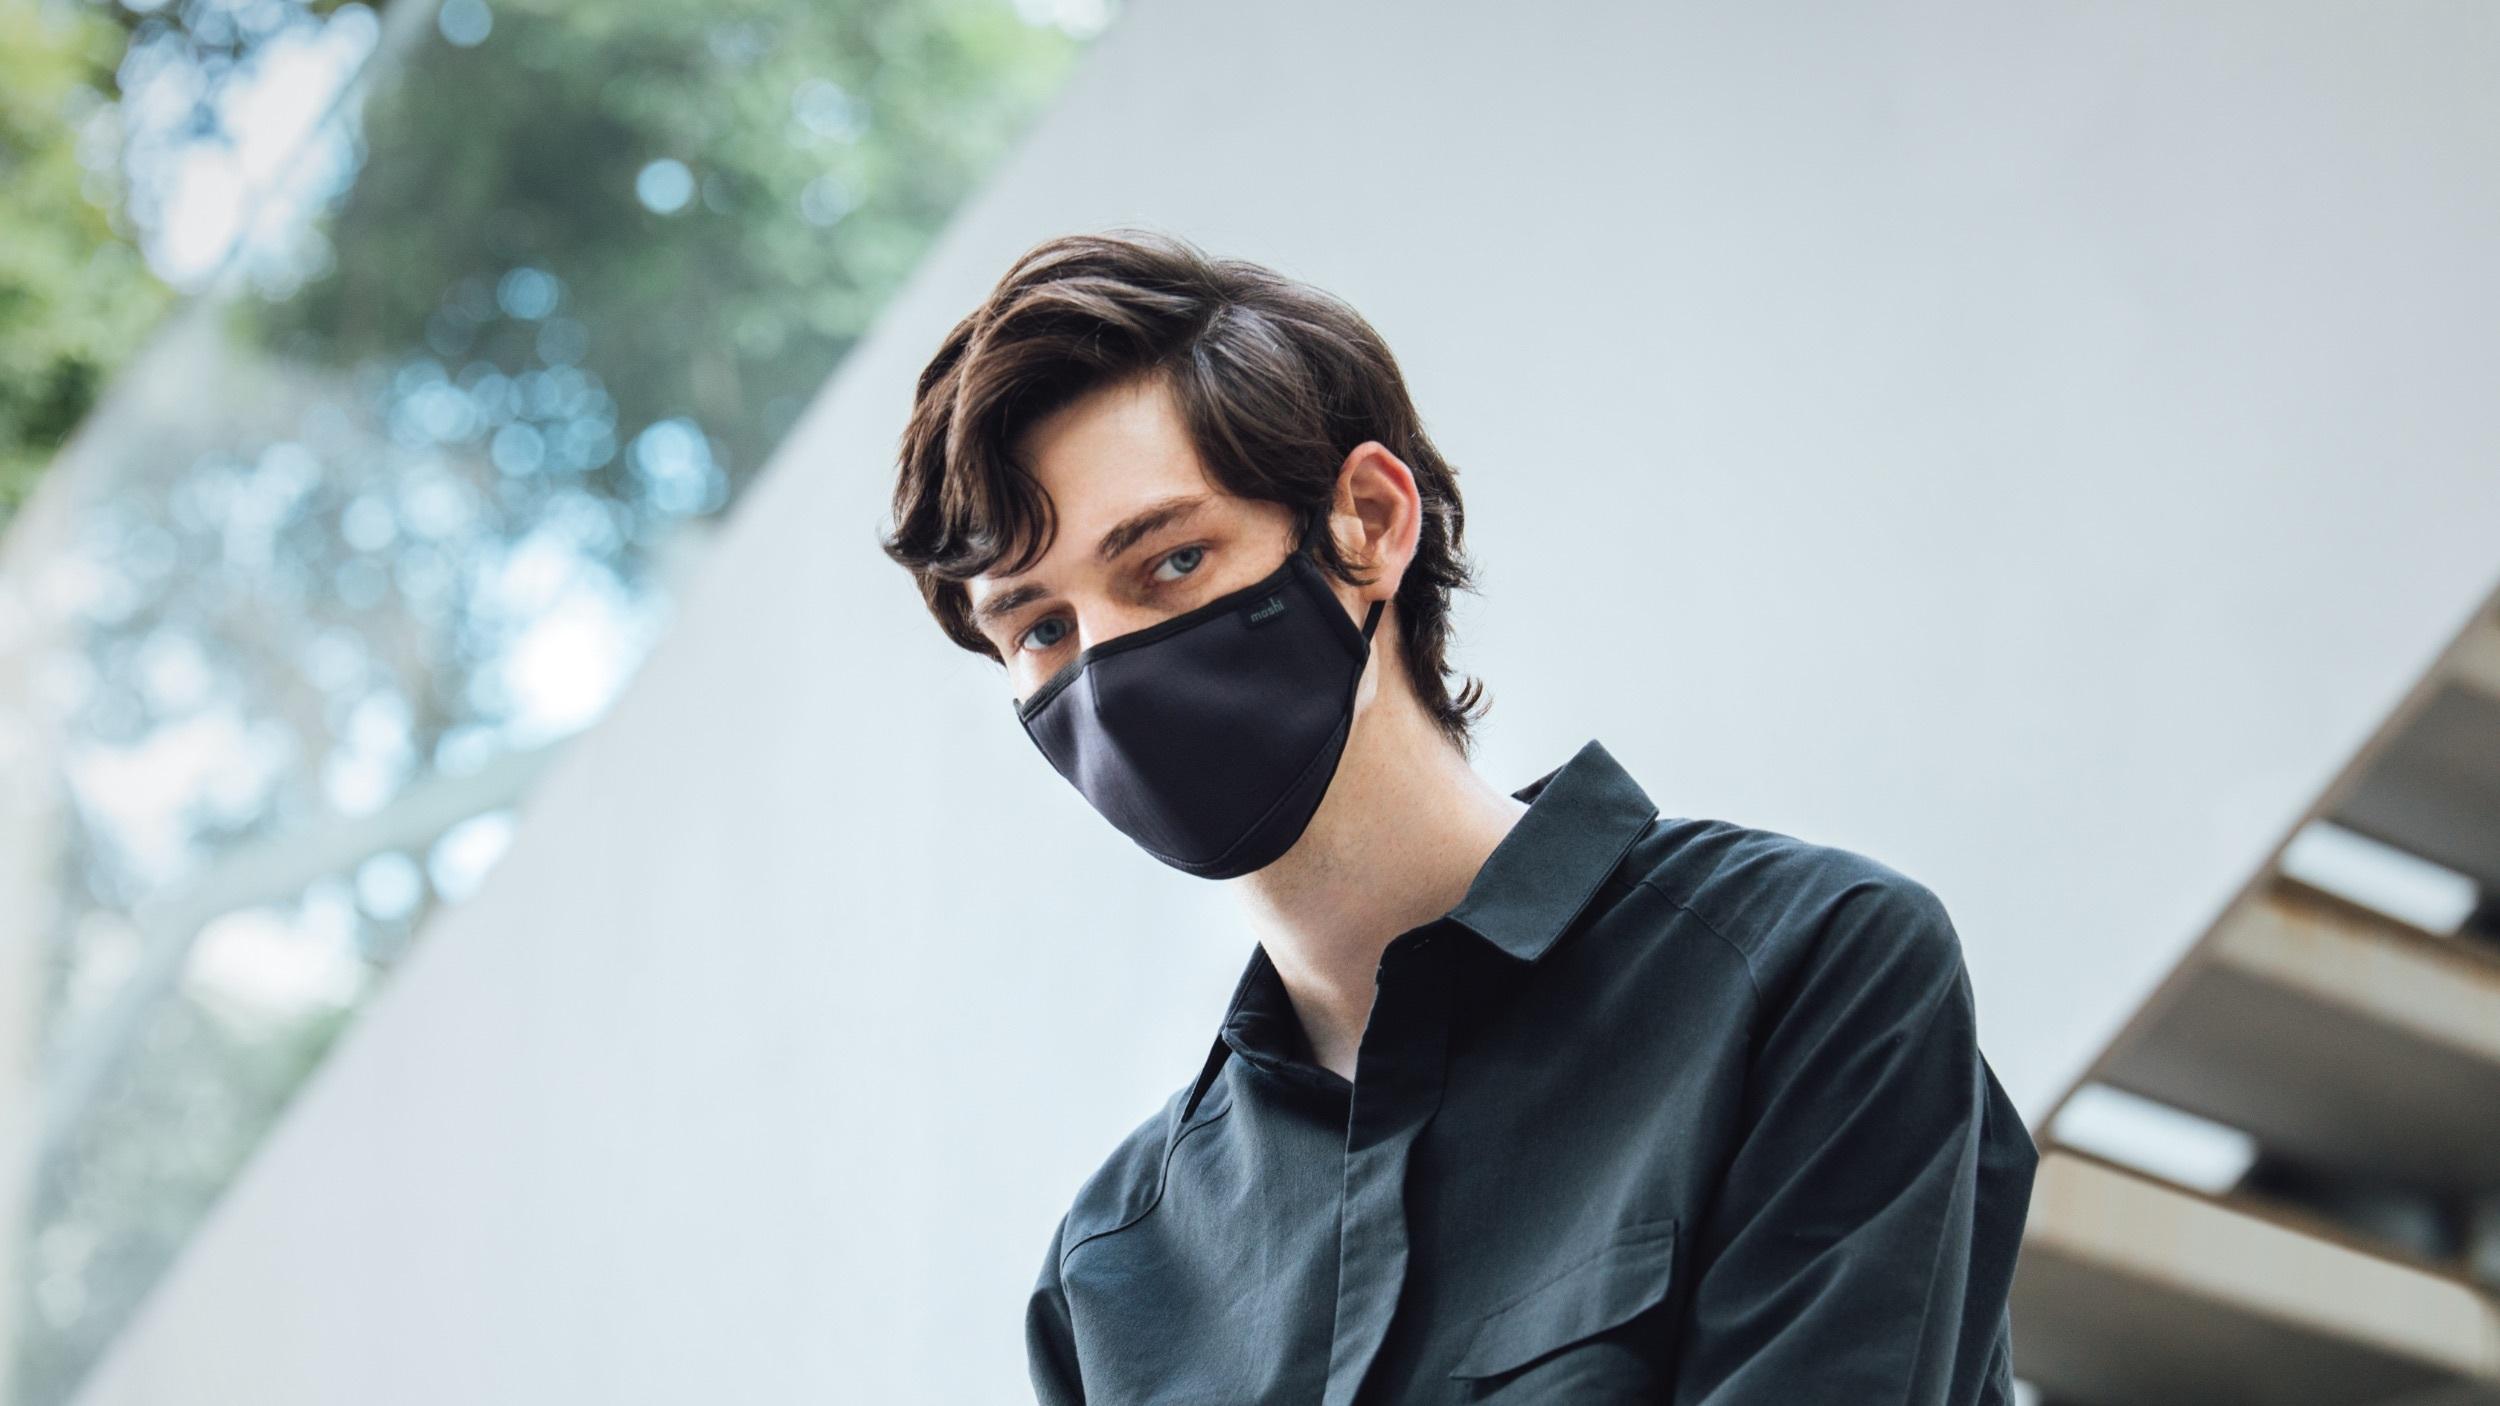 A man wearing a reusable face mask